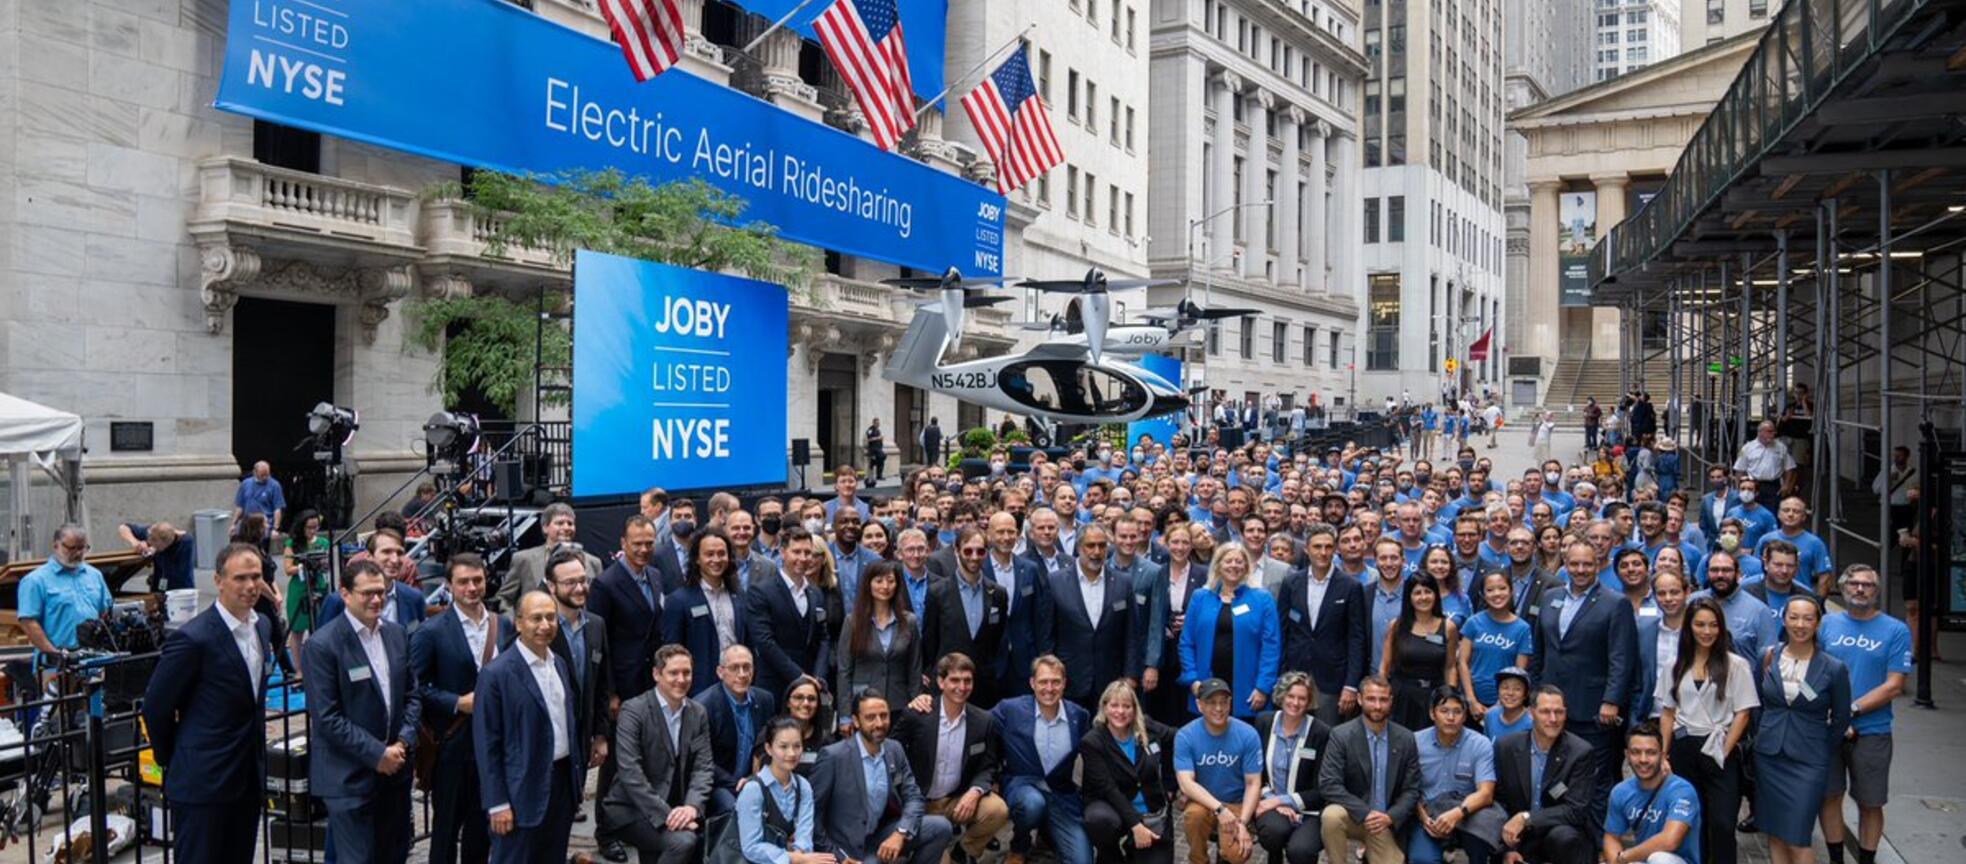 Joby on Wall Street